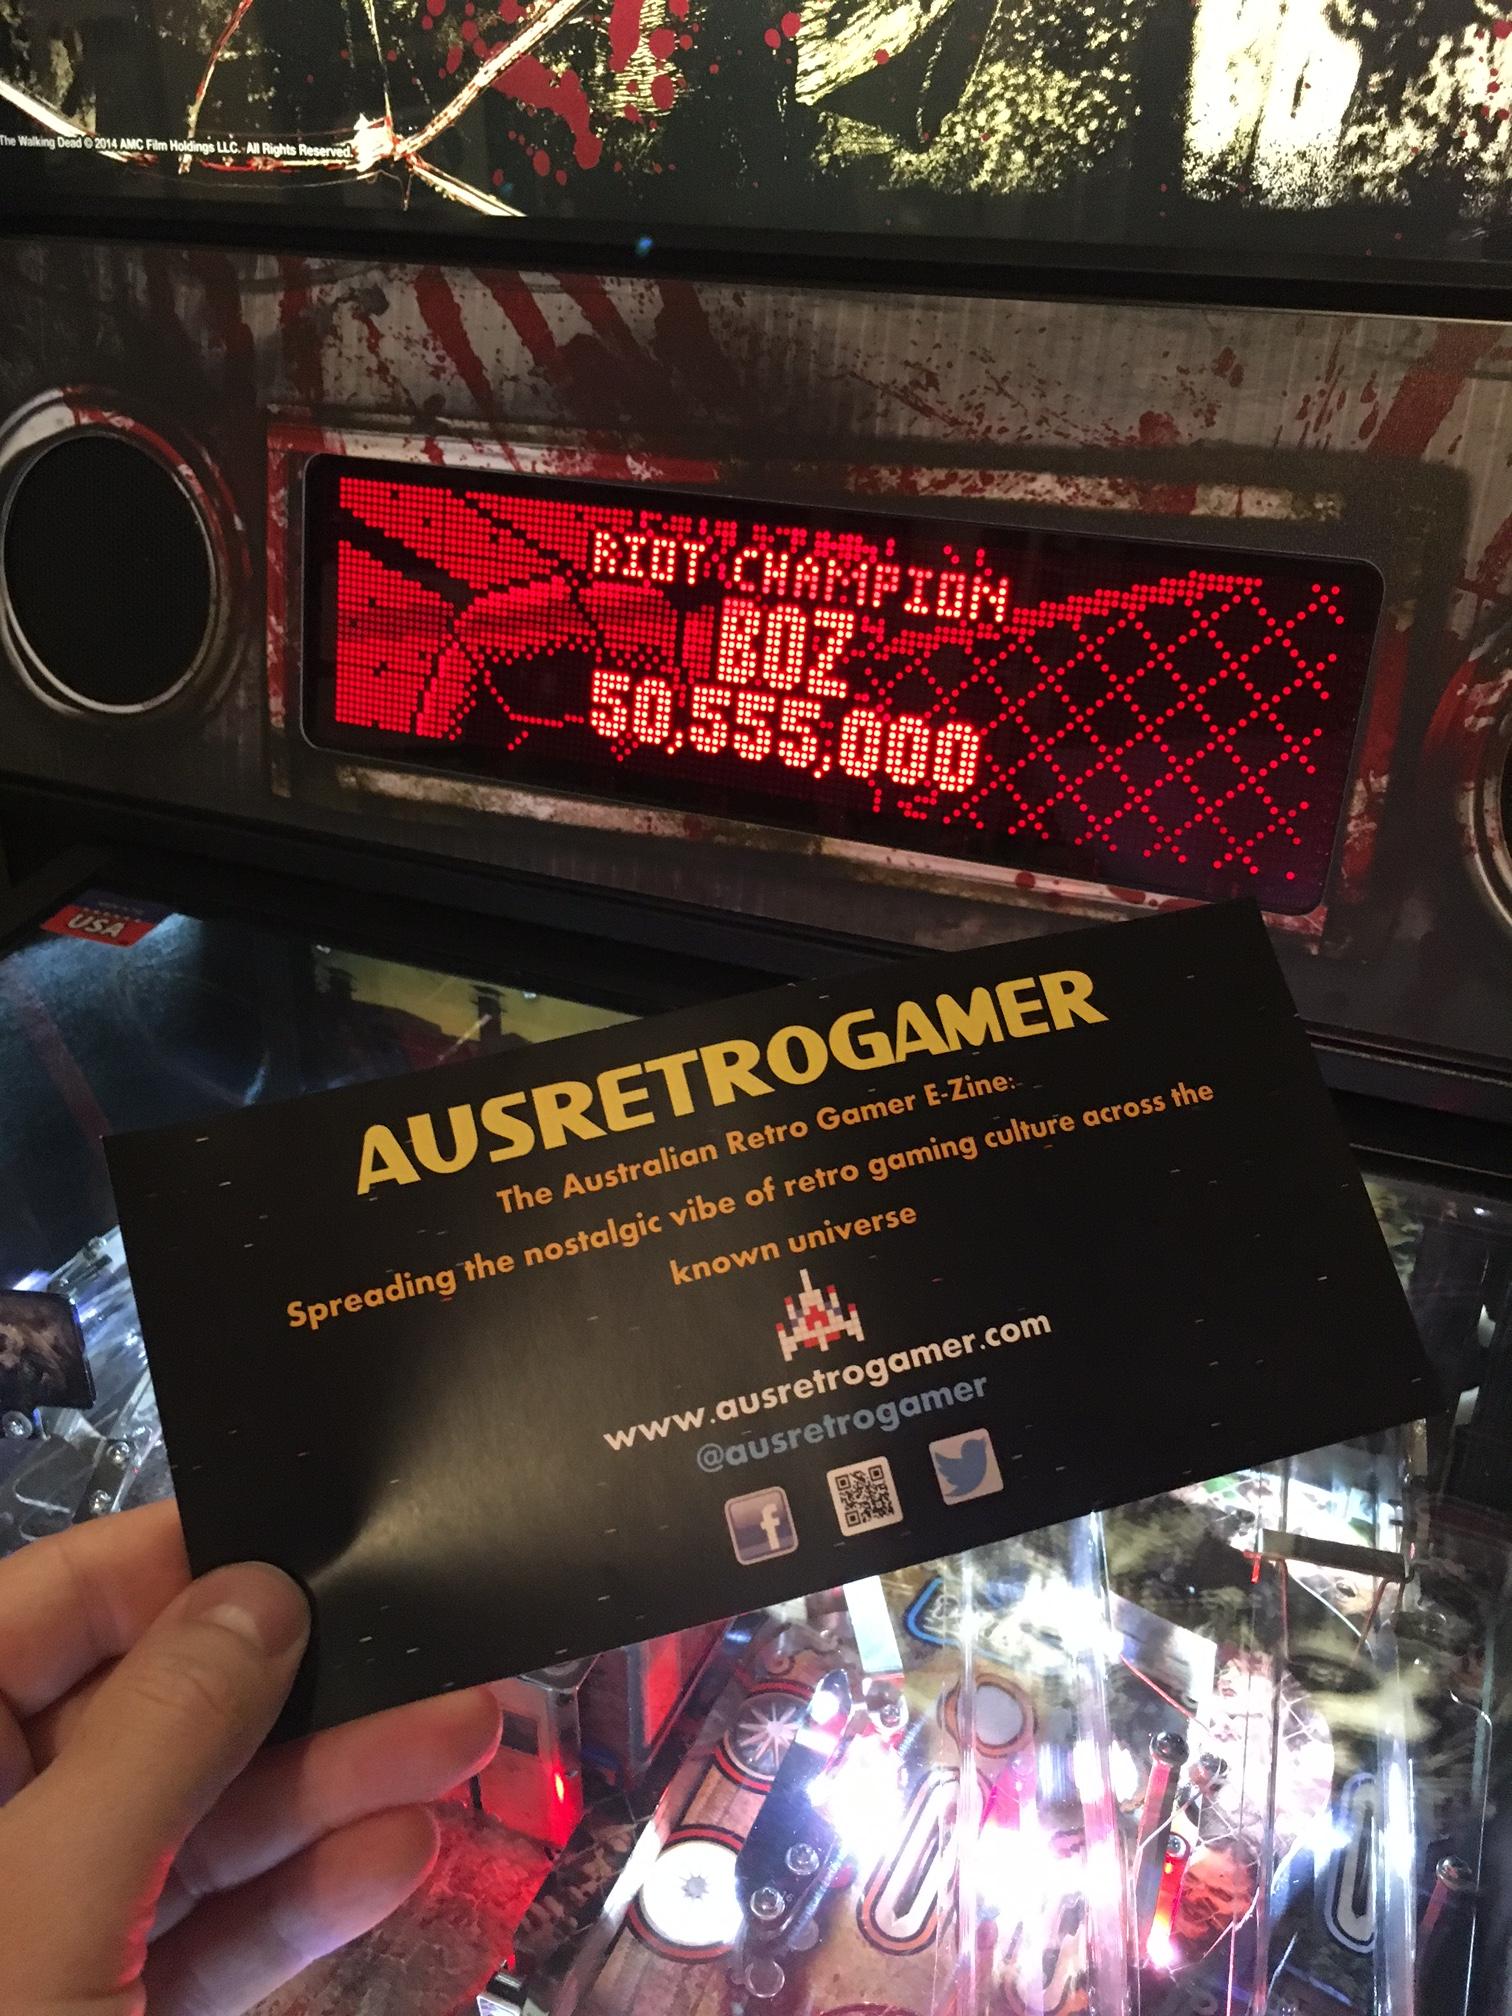 ausretrogamer: The Walking Dead: Riot Champion (Pinball Bonus Mode) 50,555,000 points on 2017-04-23 22:33:53